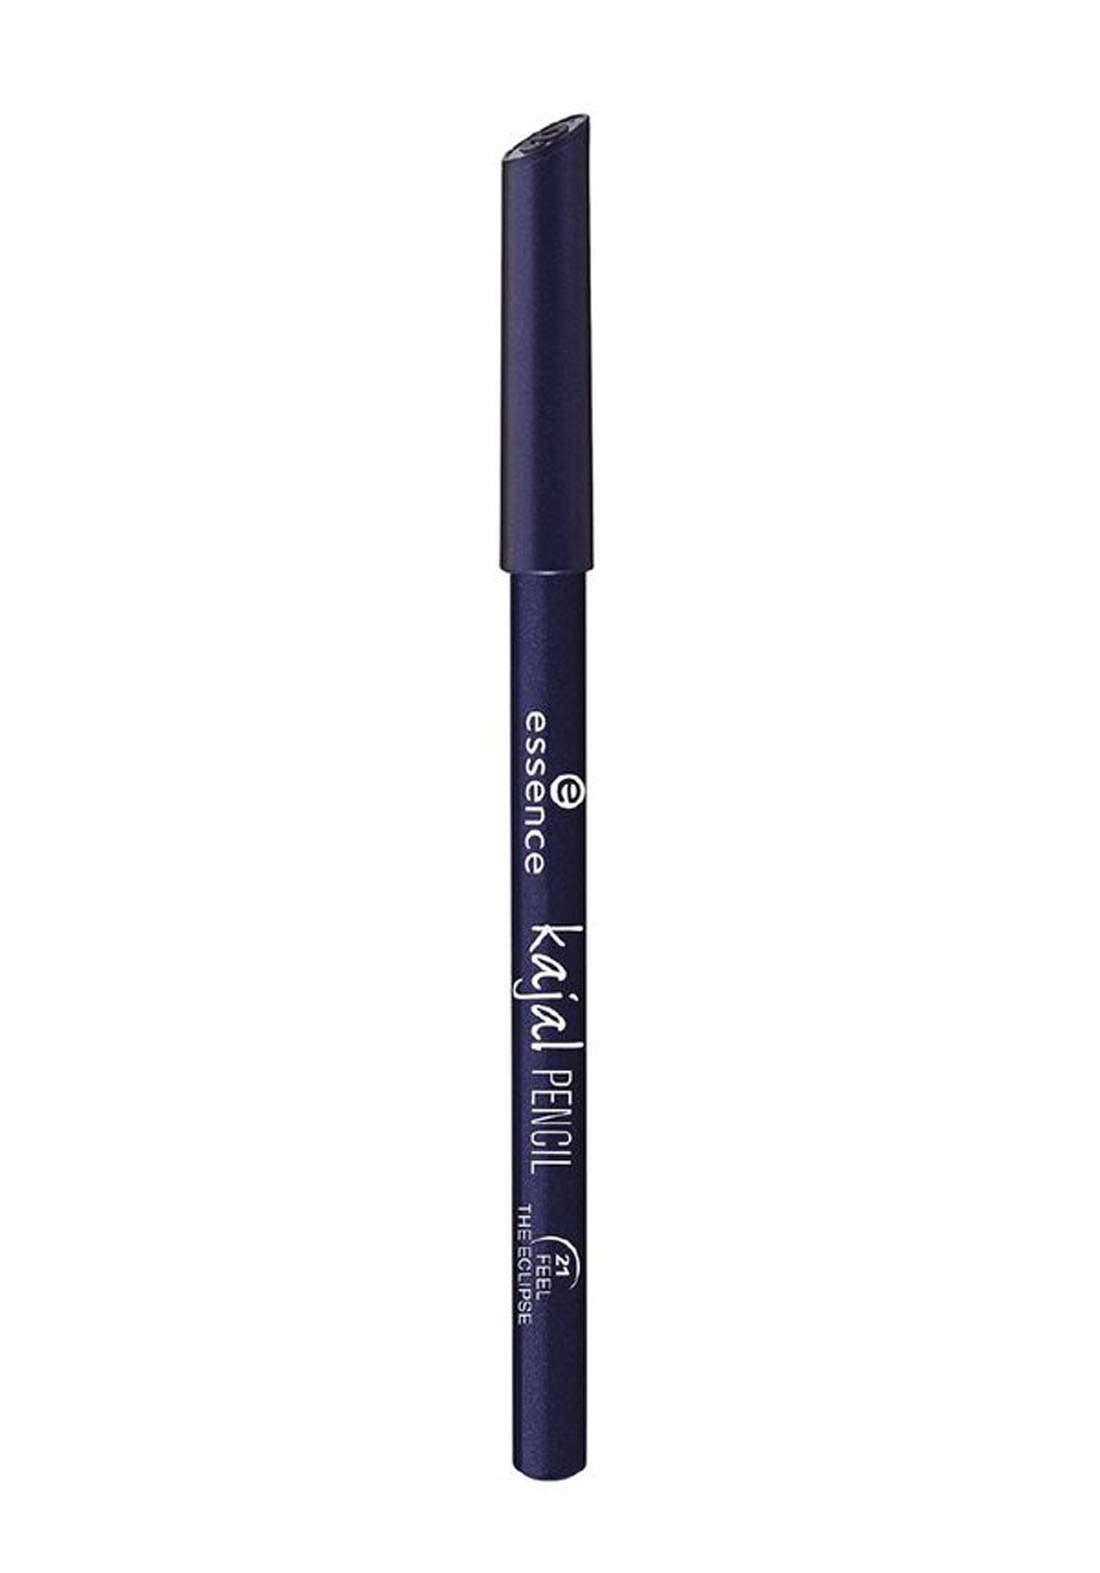 Essence Kajal Pencil No.21 Feel The Eclipse محدد العيون